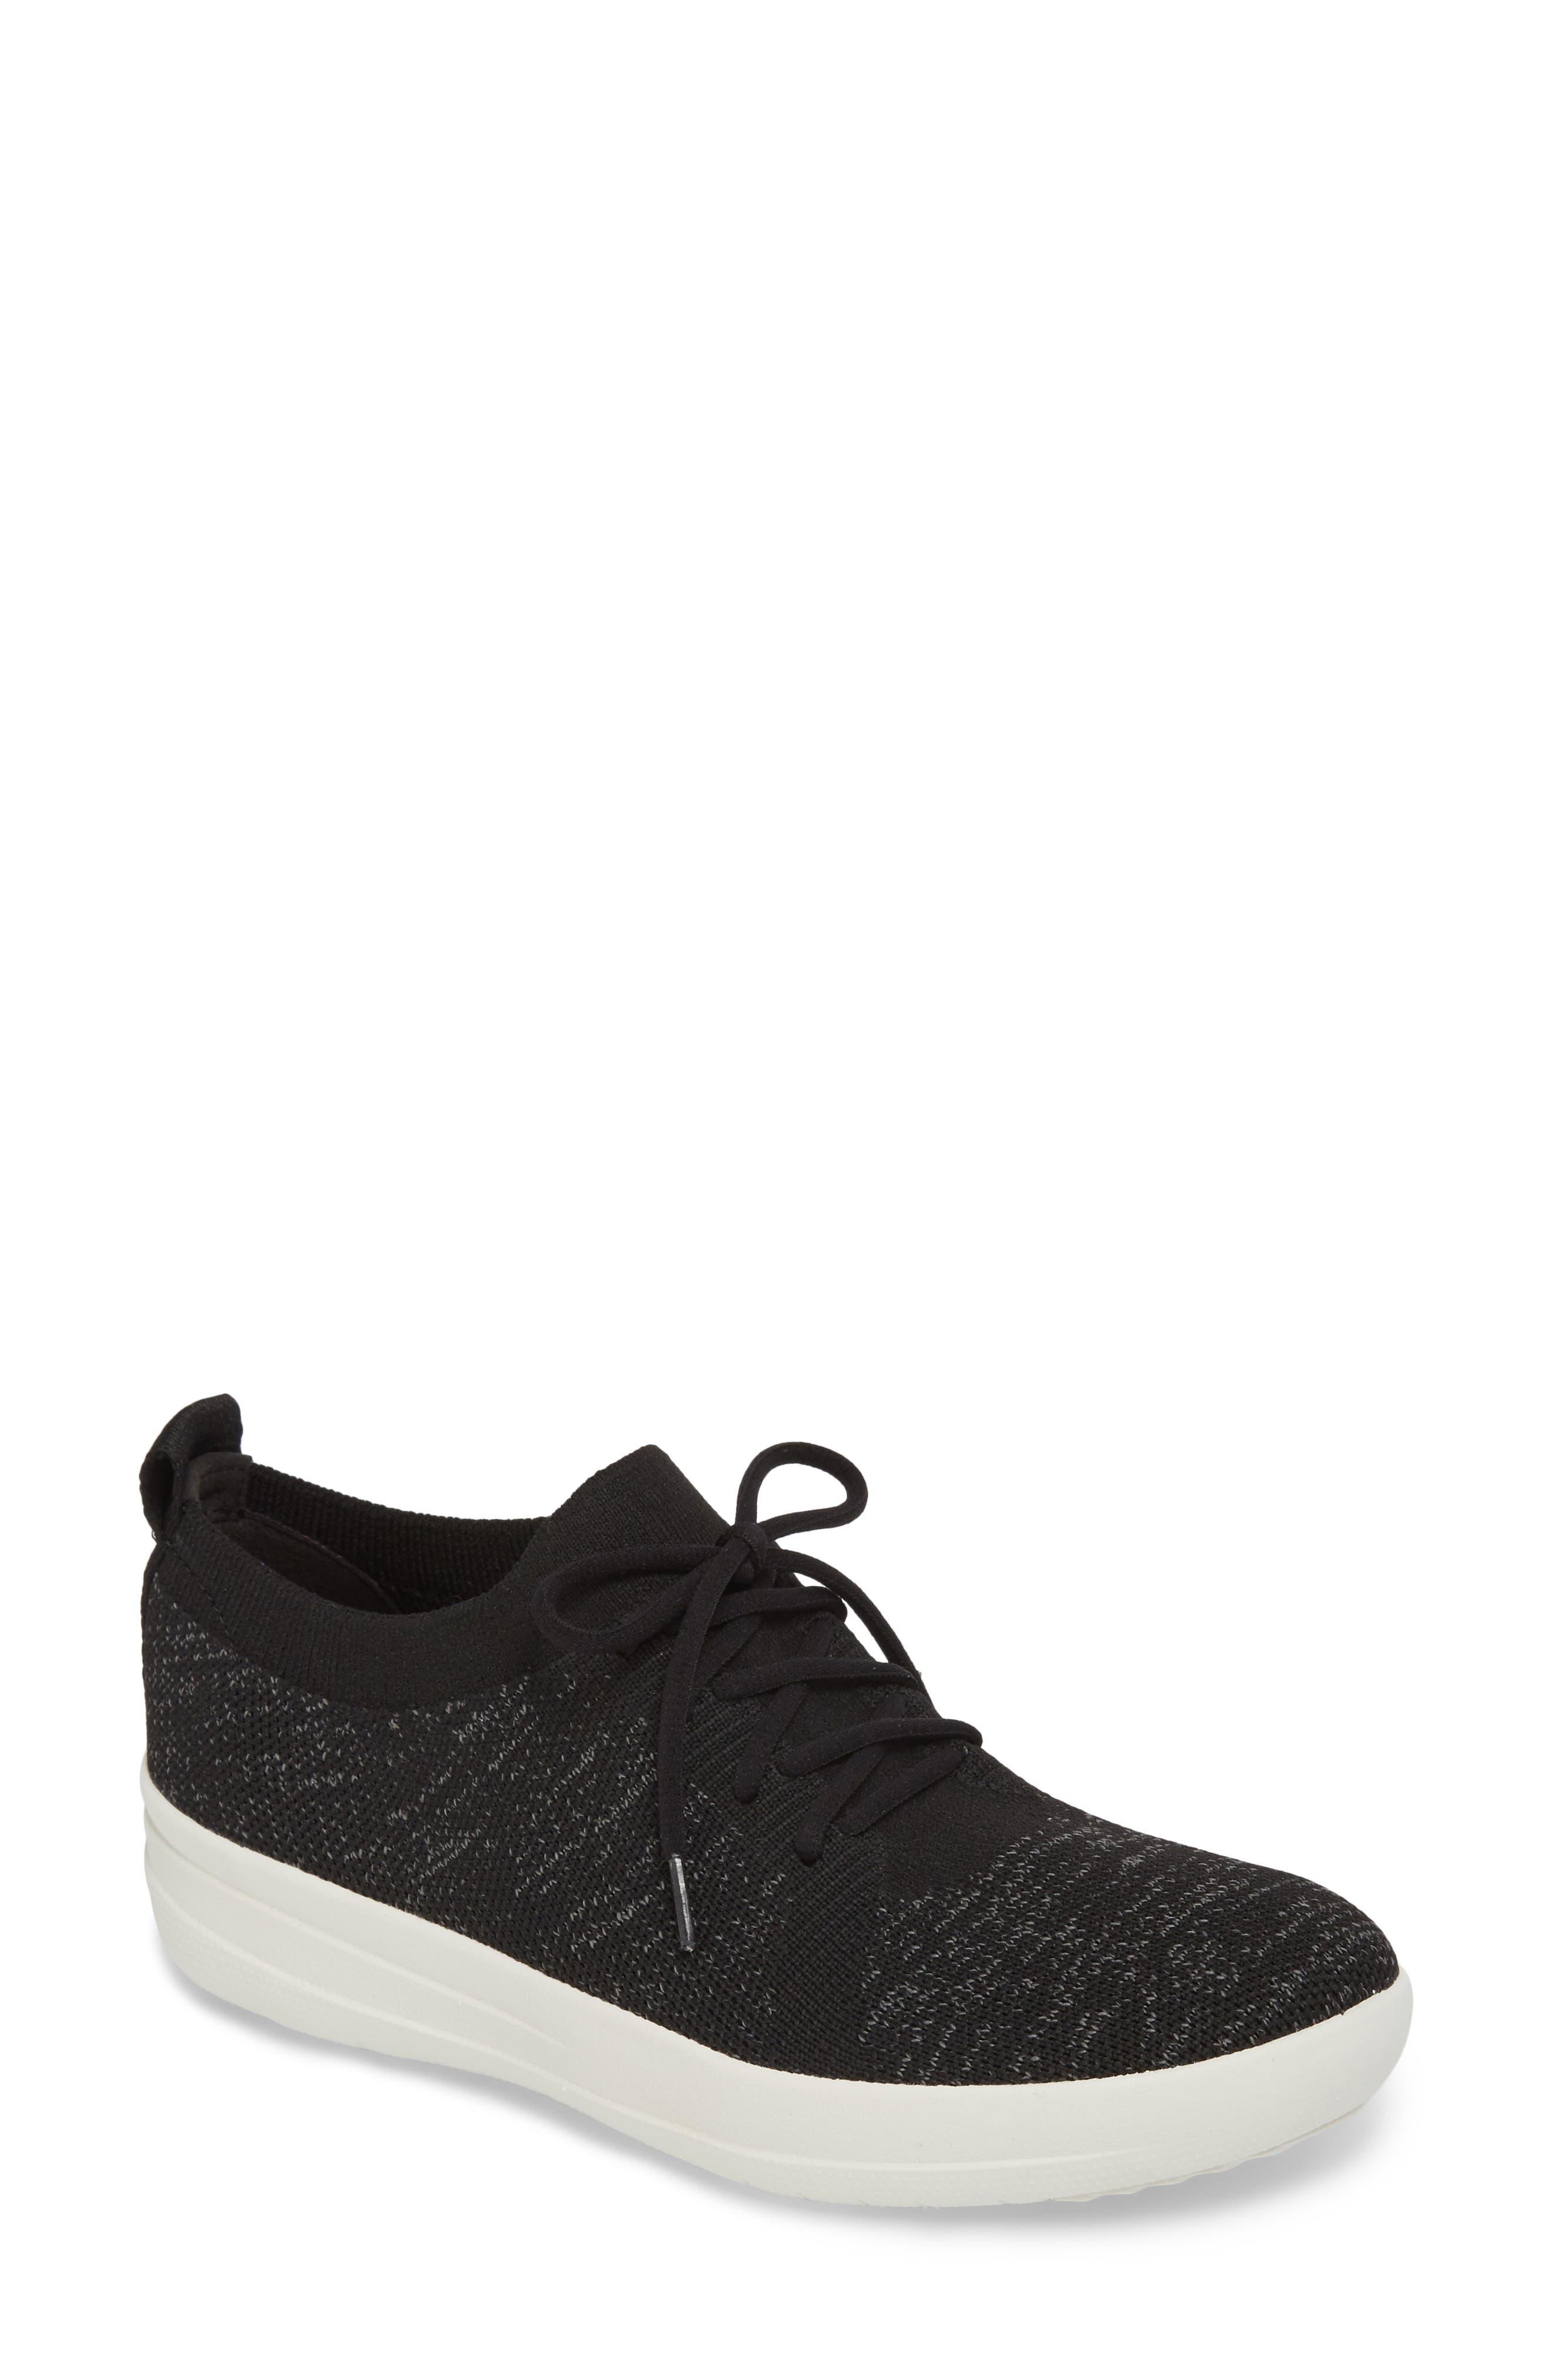 FITFLOP F-Sporty Uberknit<sup>™</sup> Sneaker, Main, color, BLACK